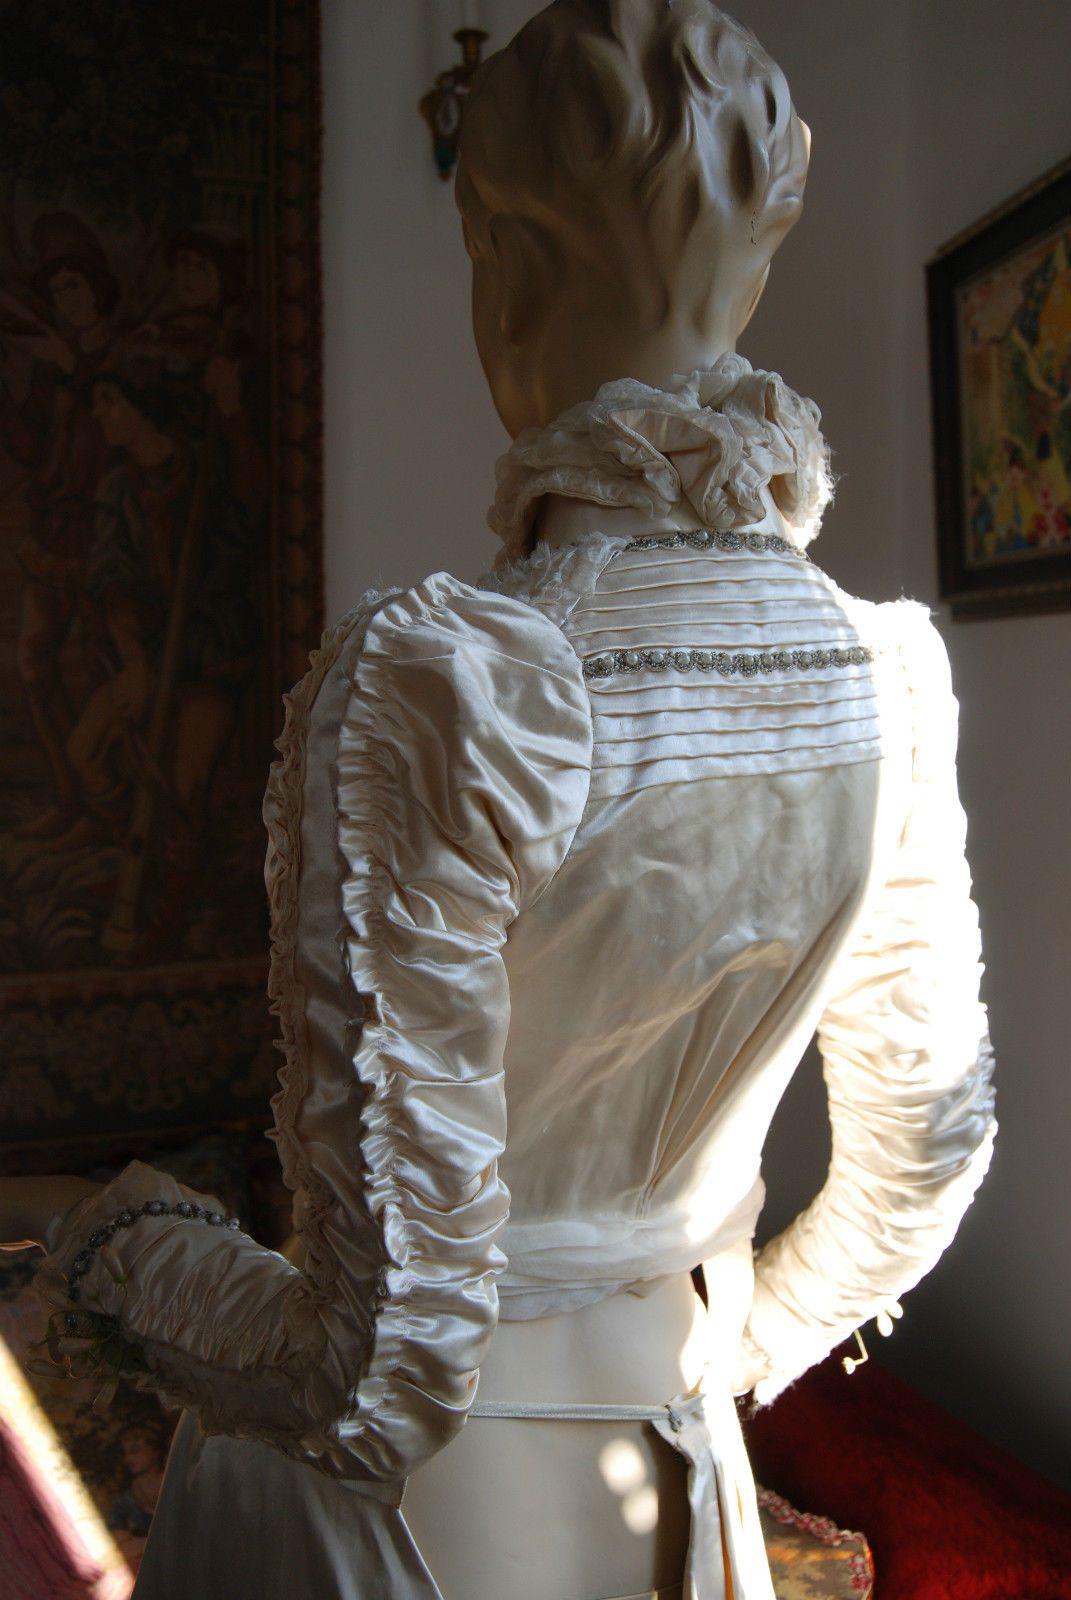 Antique handmade silk satin wedding gown dress with tiara detail